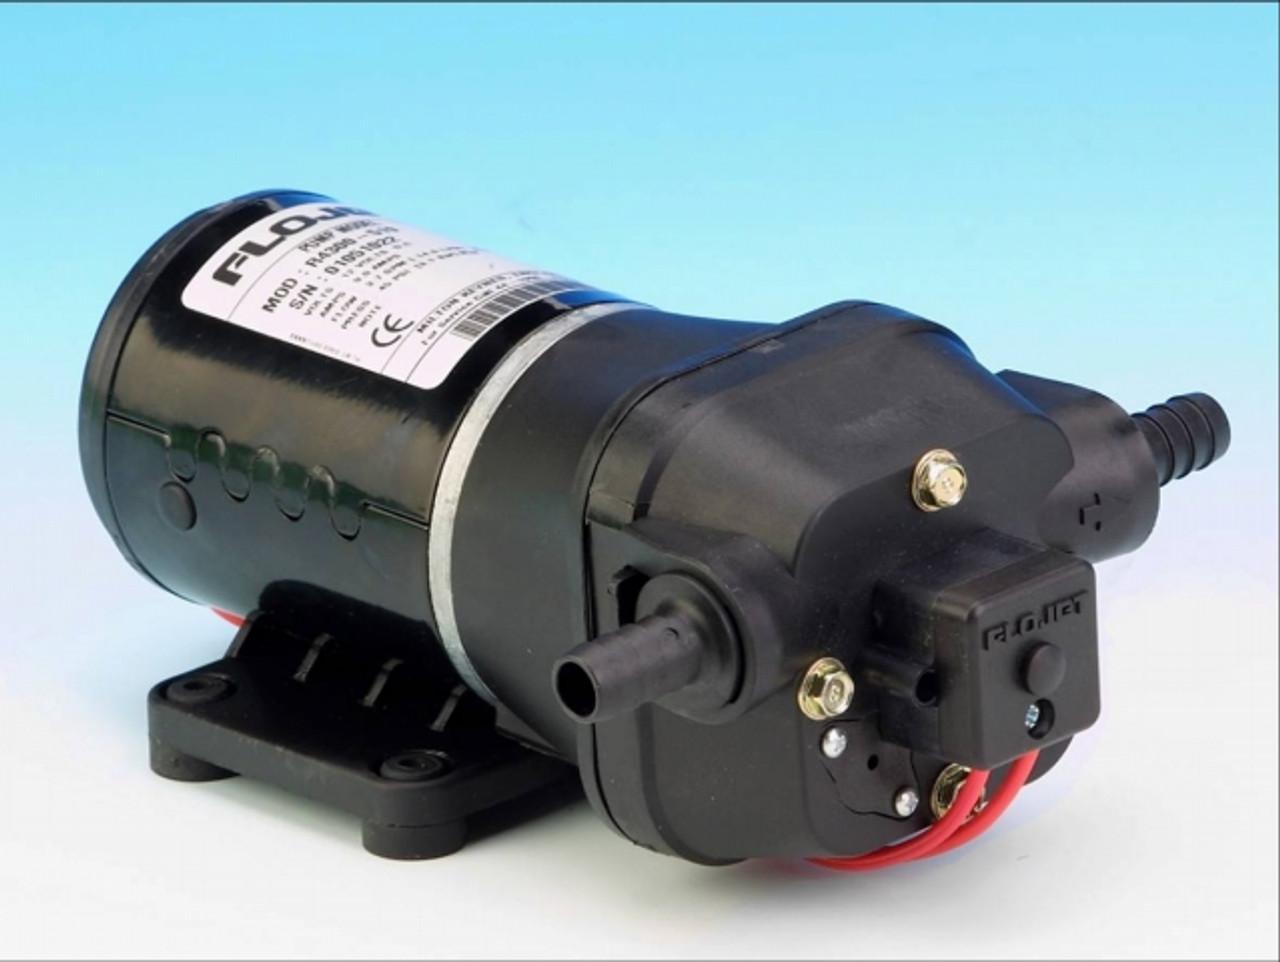 EMIAOTO New PARKSENSOR pdc Parking Sensor PZ362-00201 PZ36200201 for Toyota Camry for Lexus RX Parking Back-Up Sensor